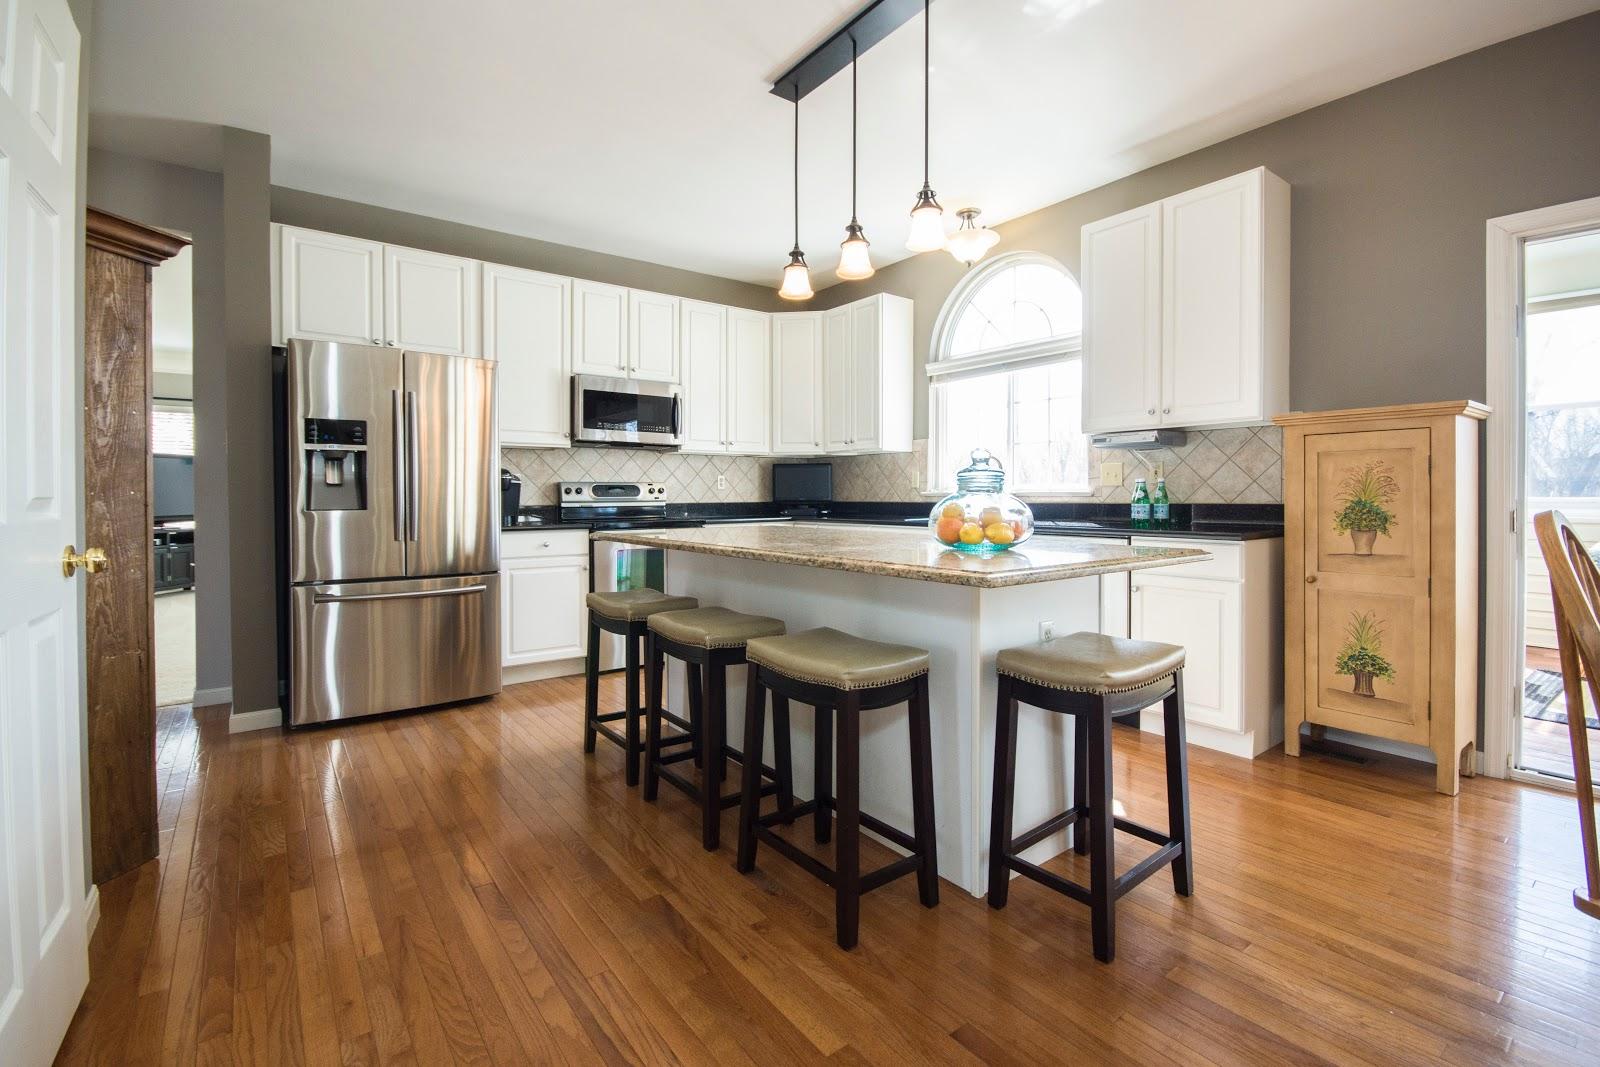 nice kitchen with hardwood floor